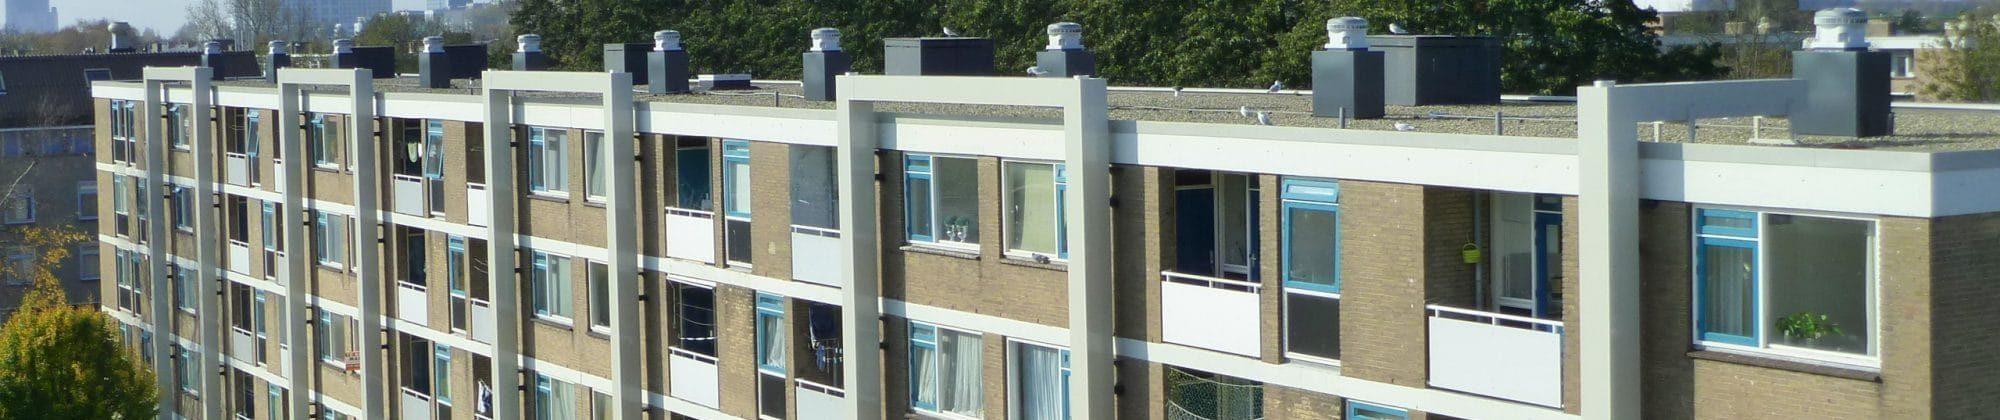 header-wooncorporatie-wooninvest-voorburg_2000x420_acf_cropped